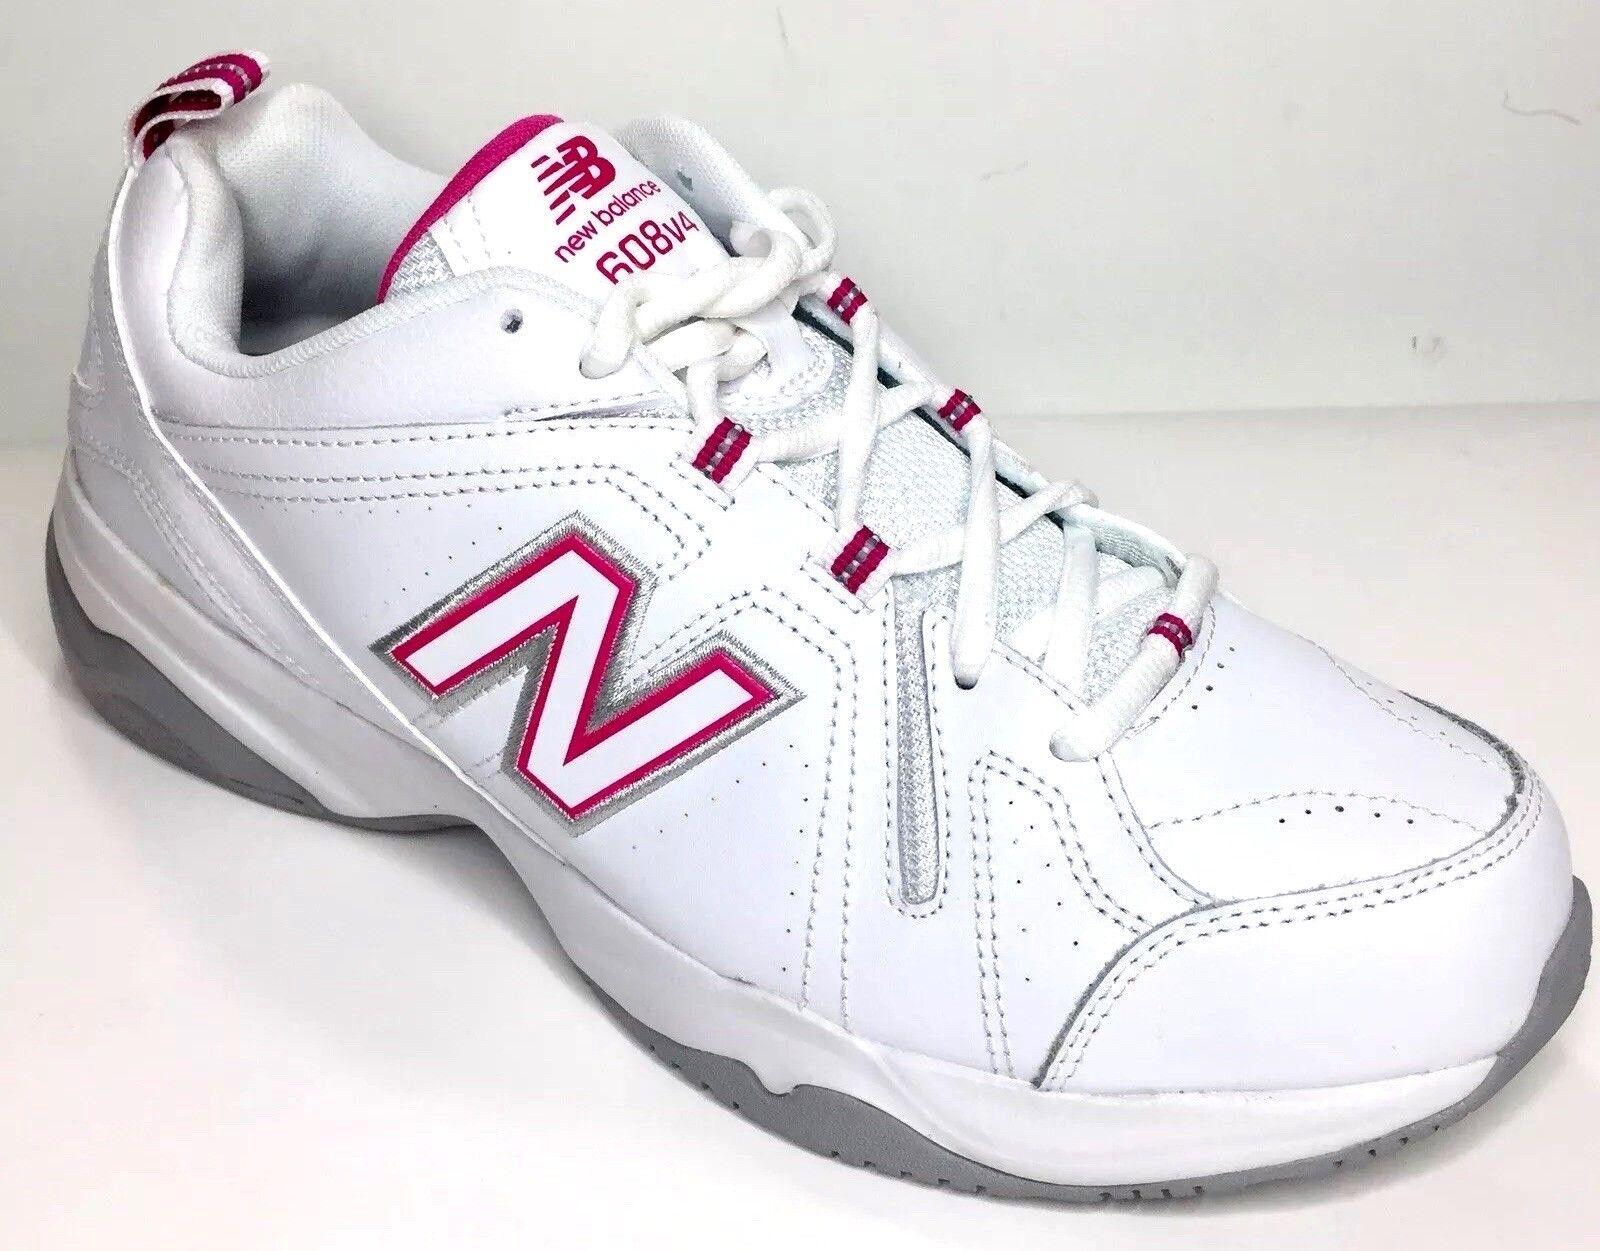 New Balance WX608V4 Walking shoes White Pink Women's Size 10